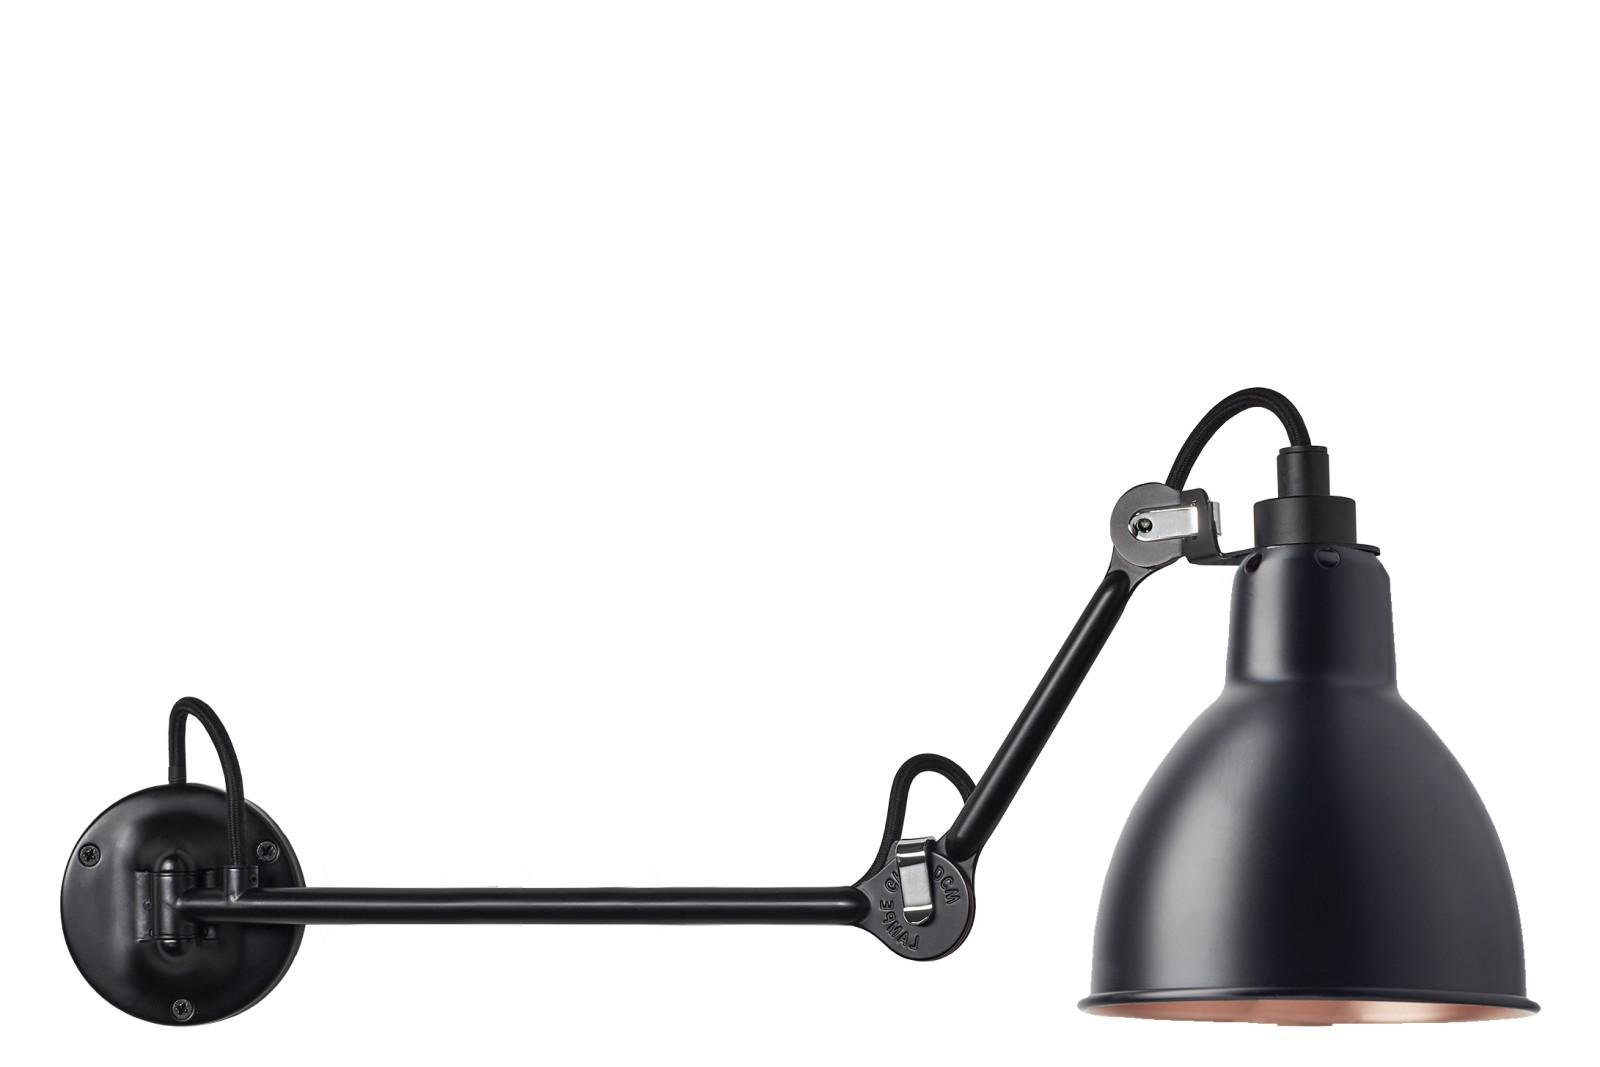 Lampe Gras N 204 Wall Light Black-Copper, 37